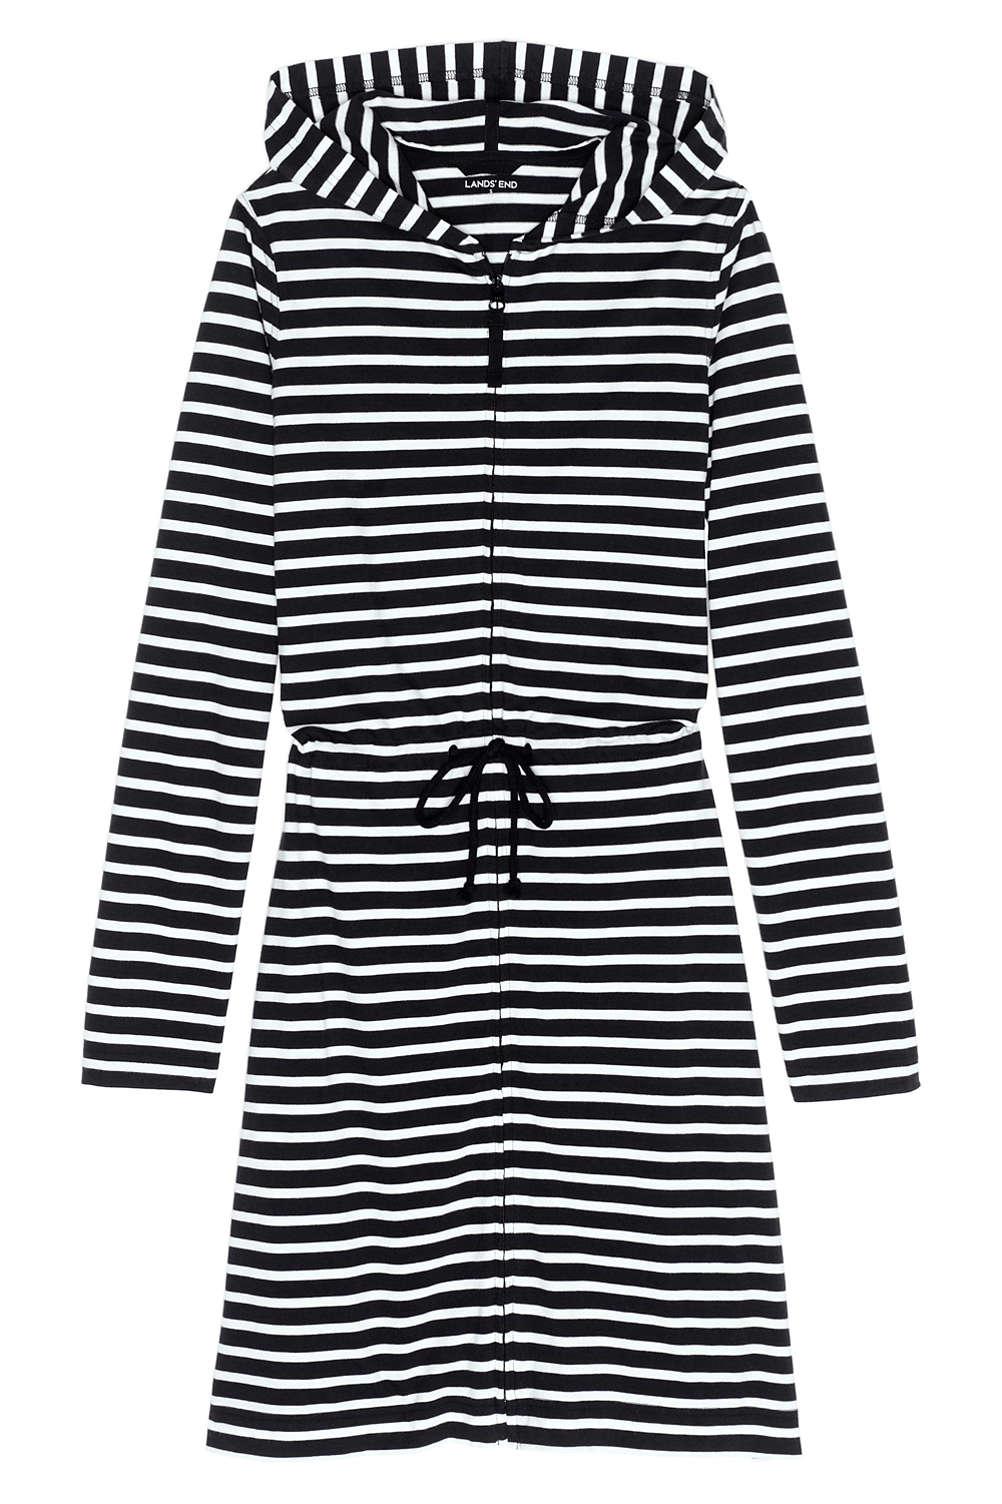 779703880cdb3 Women s Plus Size Cotton Jersey Hooded Full Zip Swim Cover-up Stripe ...